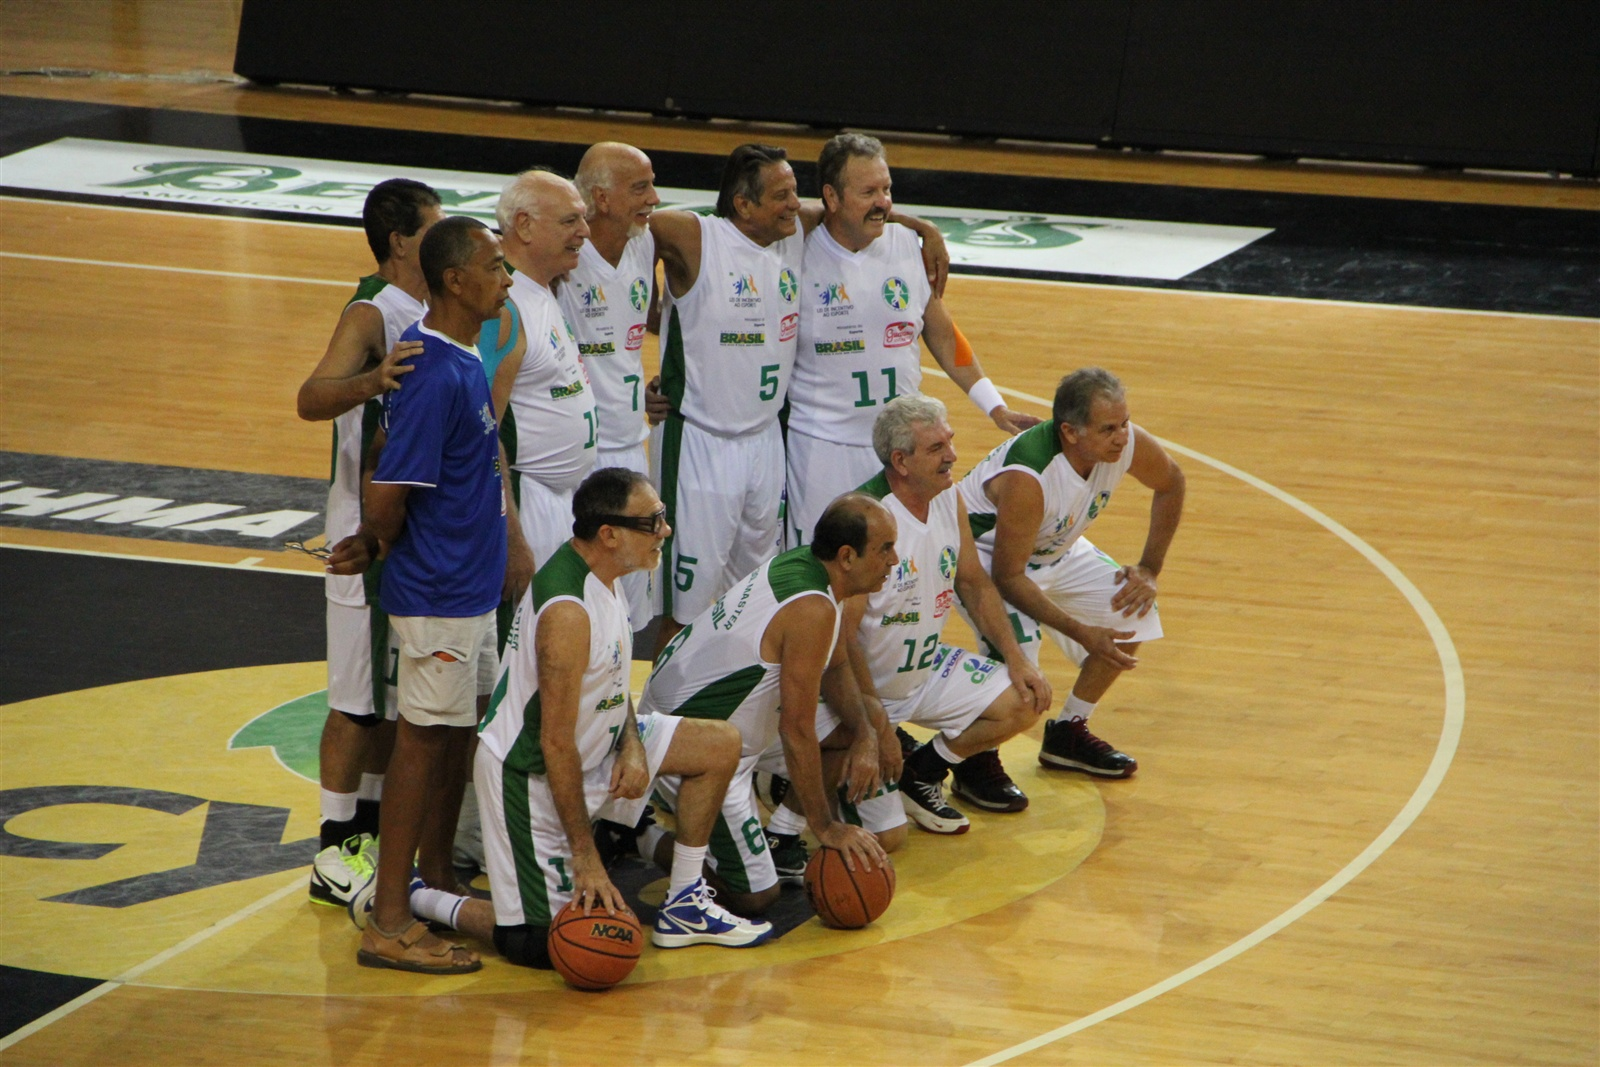 BRAZIL B VS THESSALONIKI GREECE